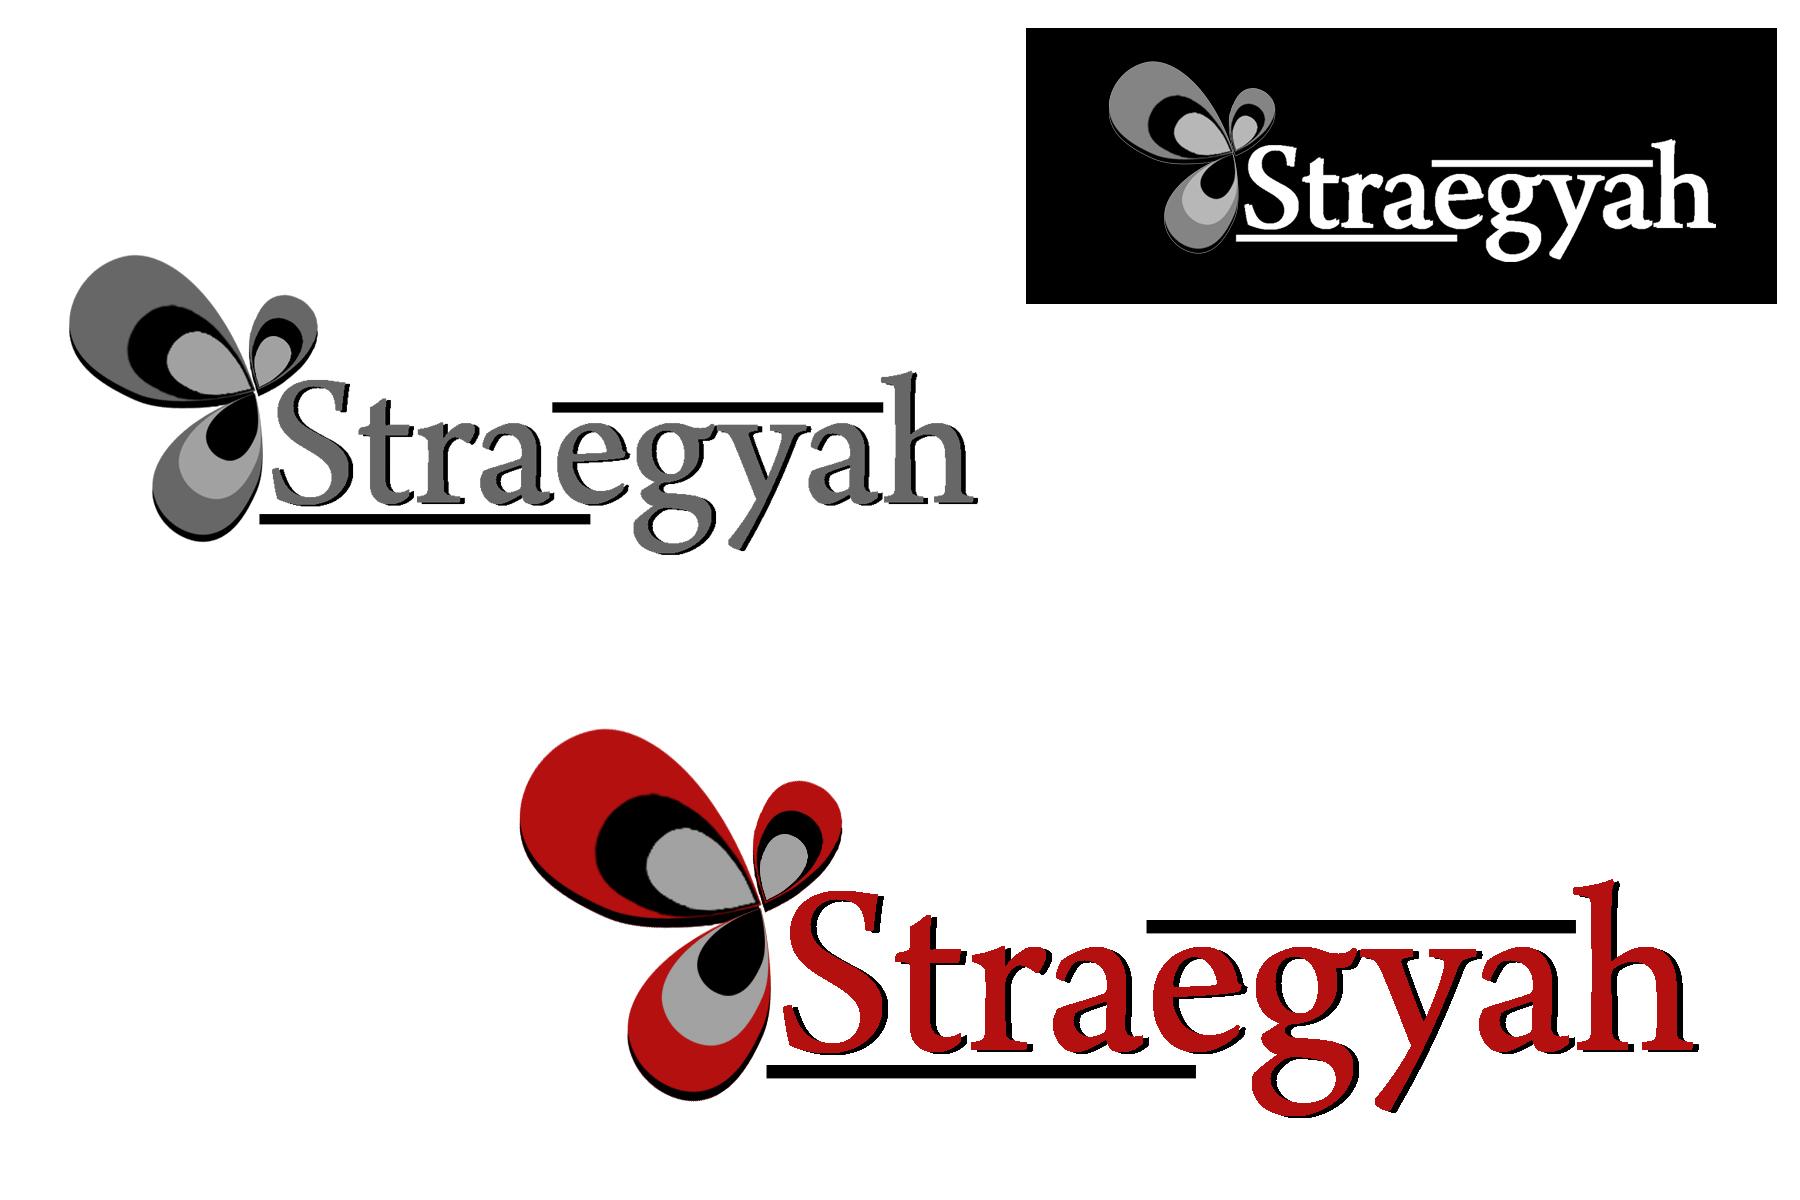 Logo Design by Dumidu Padeniya - Entry No. 207 in the Logo Design Contest Creative Logo Design for Strategyah.